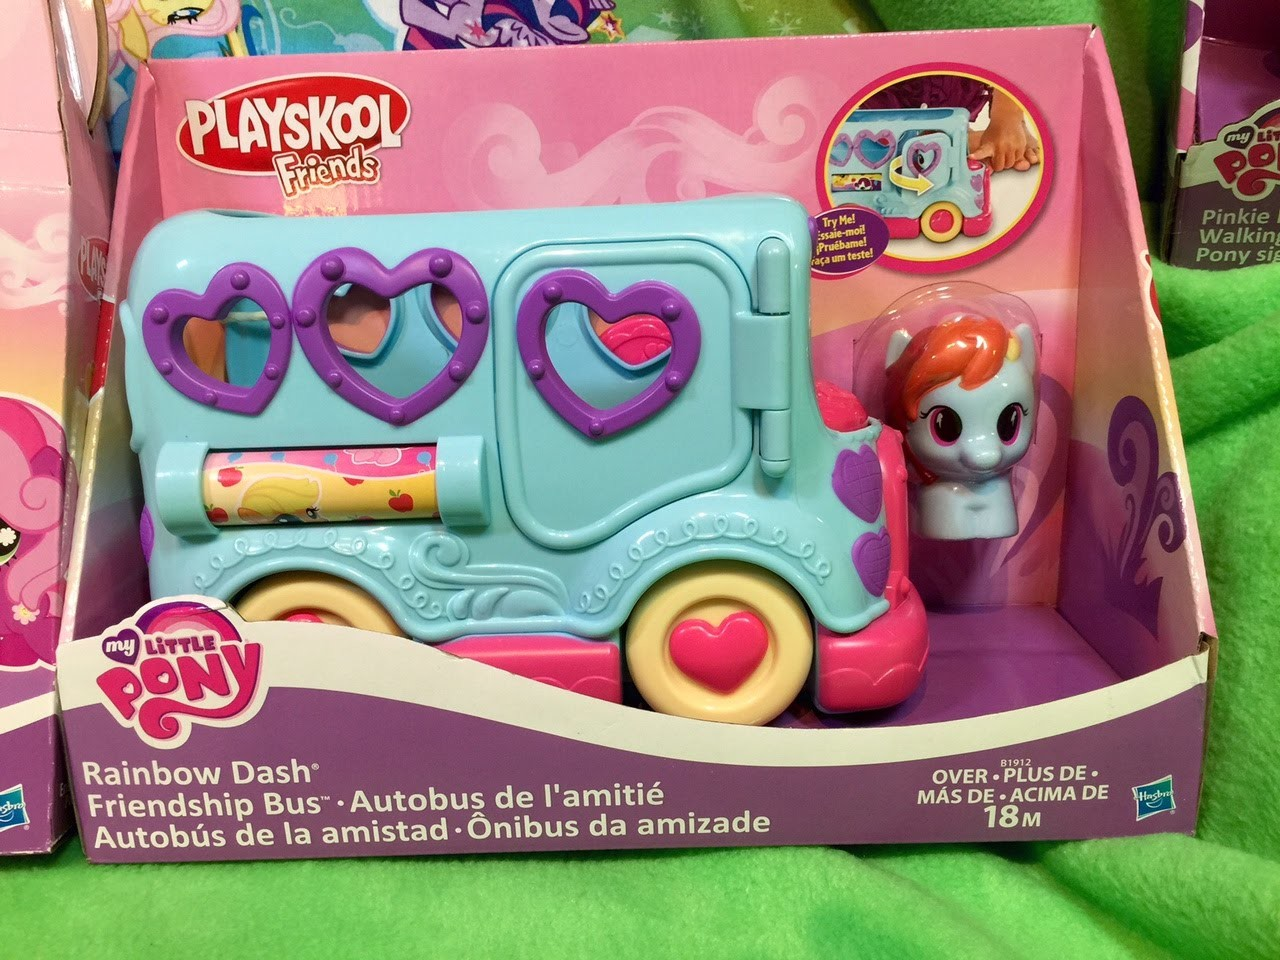 New Rainbow Dash Friendship Bus My Little Pony Playskool MLP Toy